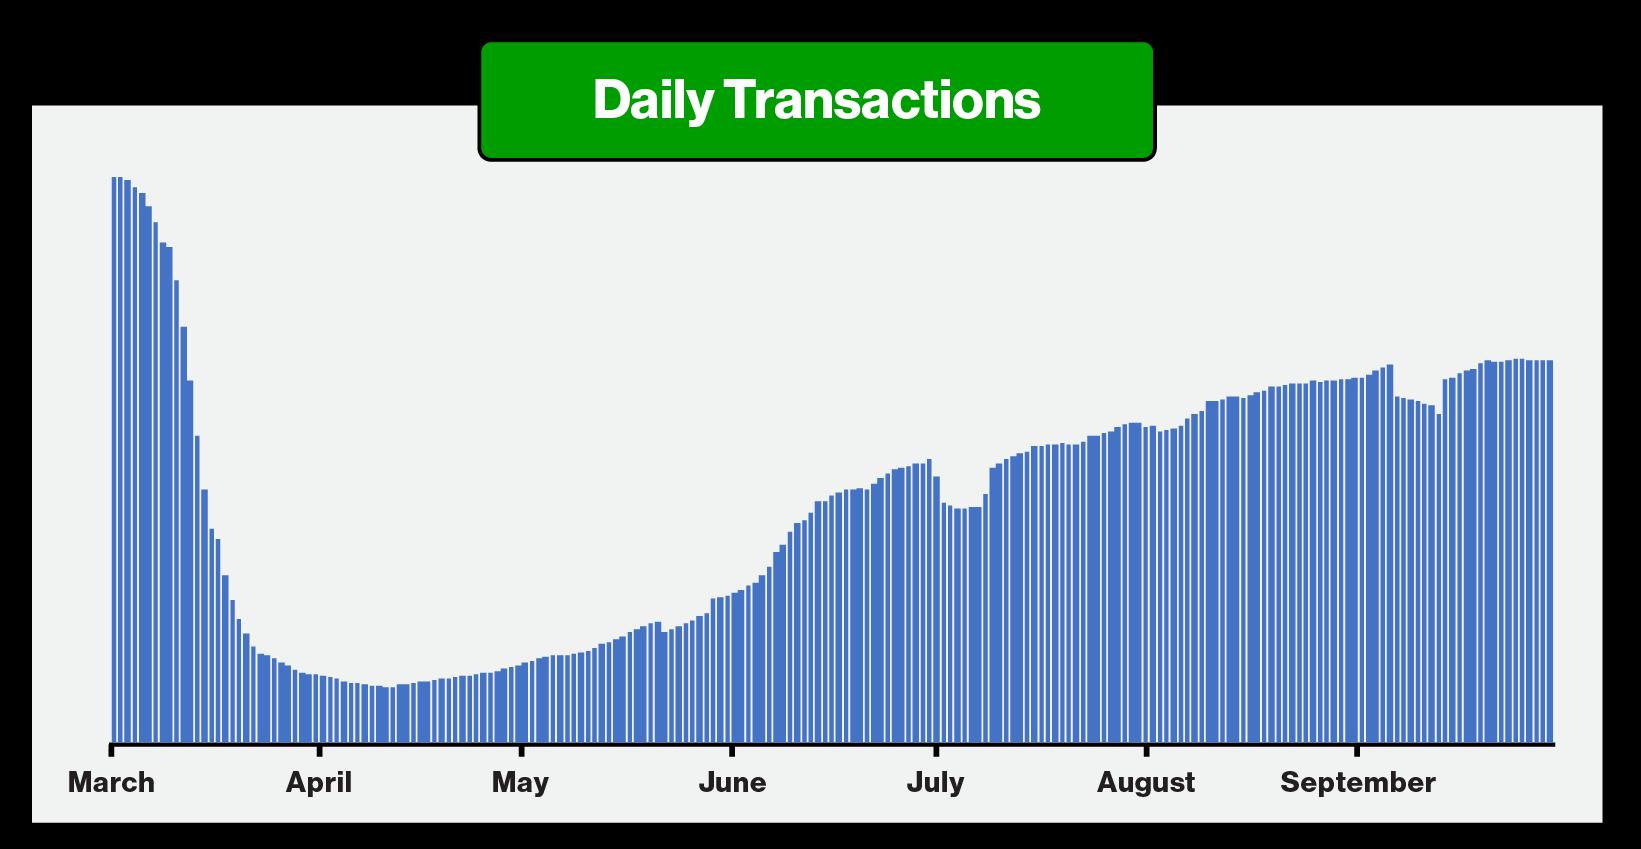 Daily Transactions - ParkMobile